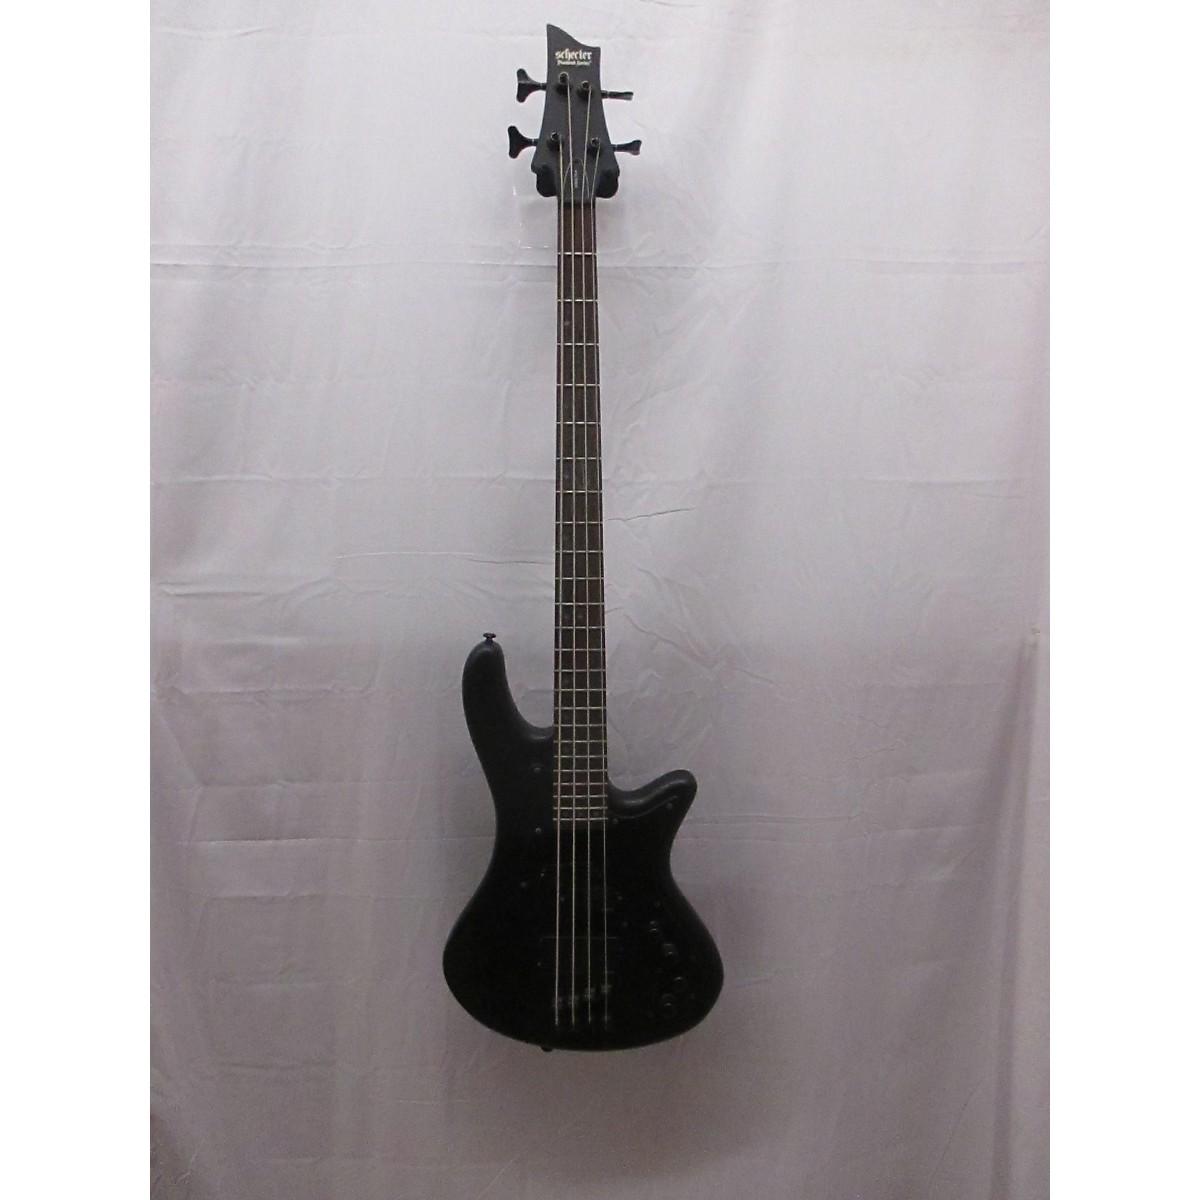 Schecter Guitar Research 2018 STEALTH 4 Electric Bass Guitar